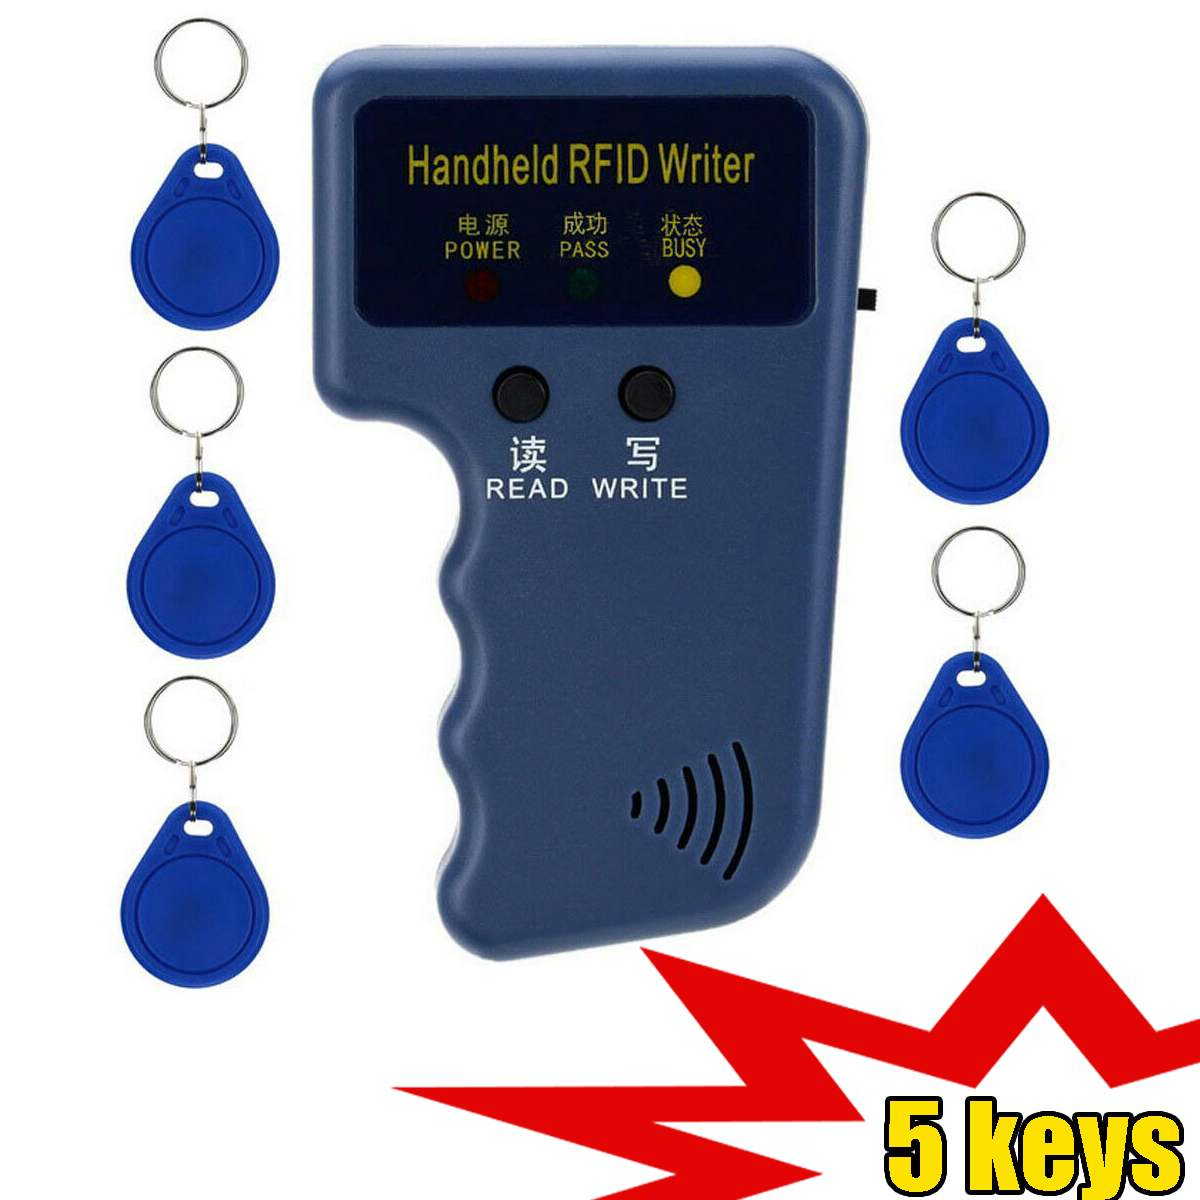 Handheld 125KHz RFID Copier Writer Portable Programmer Reader Support EM4305 T5577 5200 Copy Keychain And Identification Tag